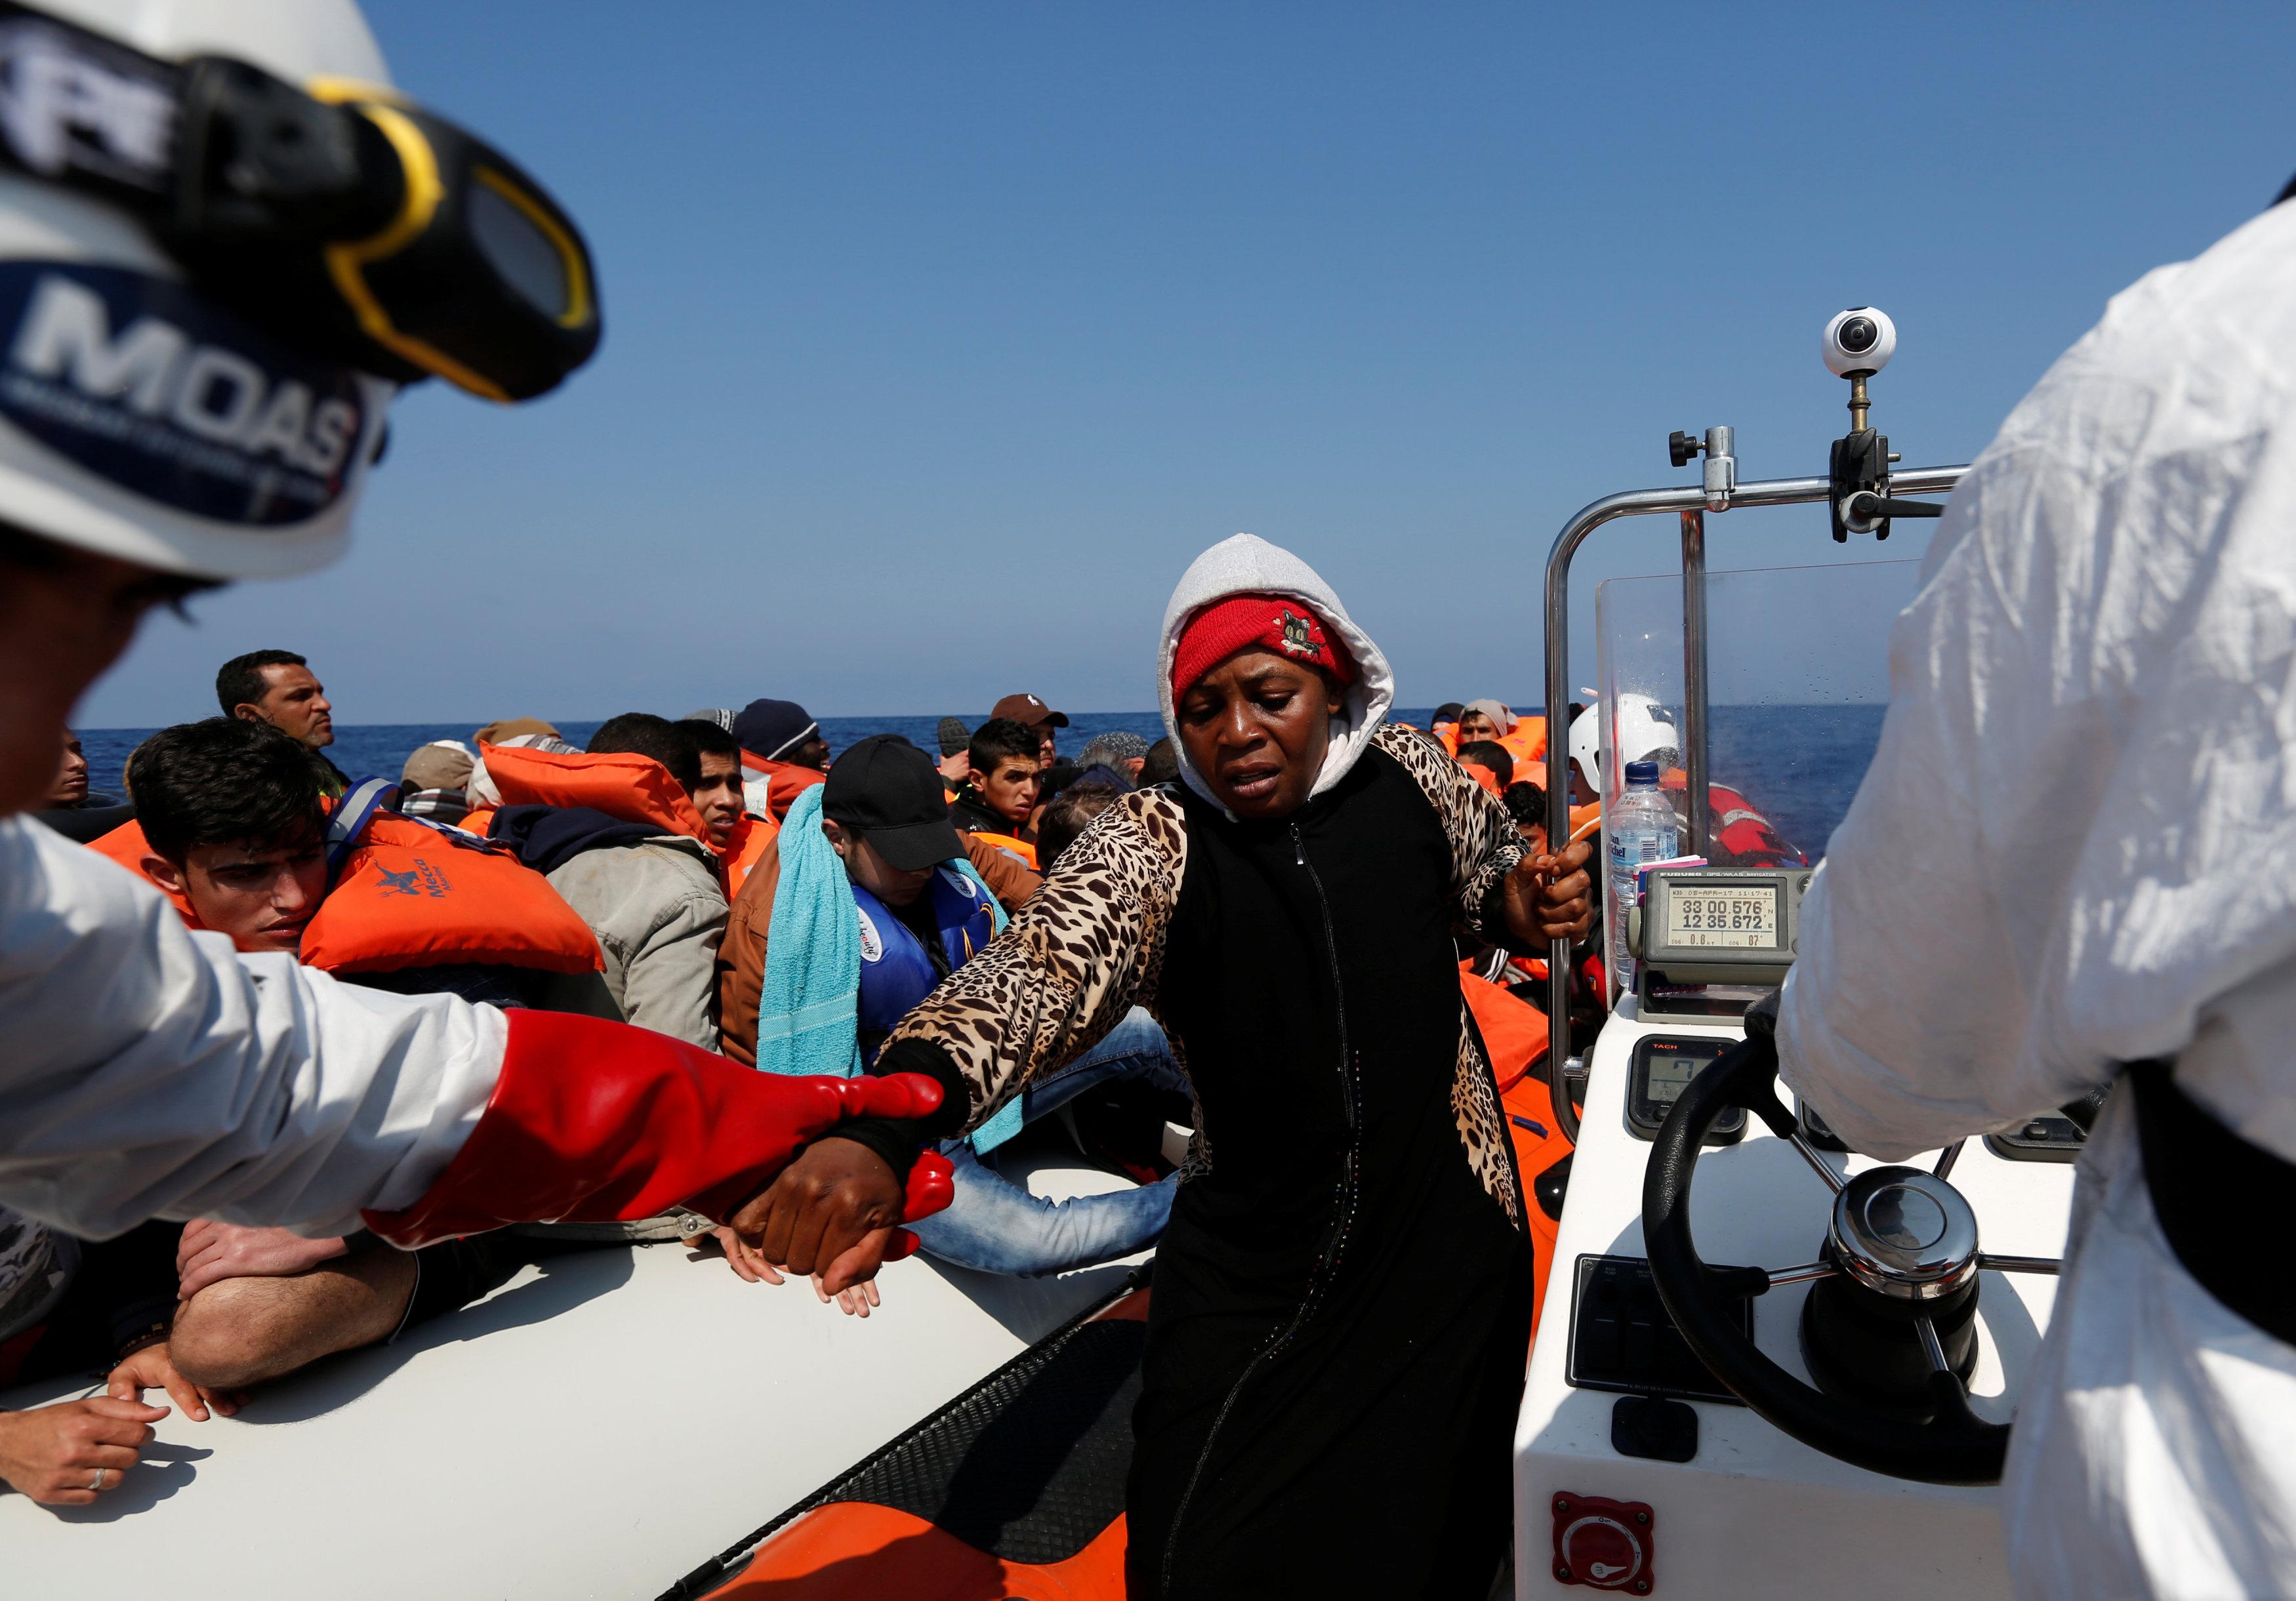 Photo of إيطاليا تبحث عن مُهاجرين جزائريين وسط البحر